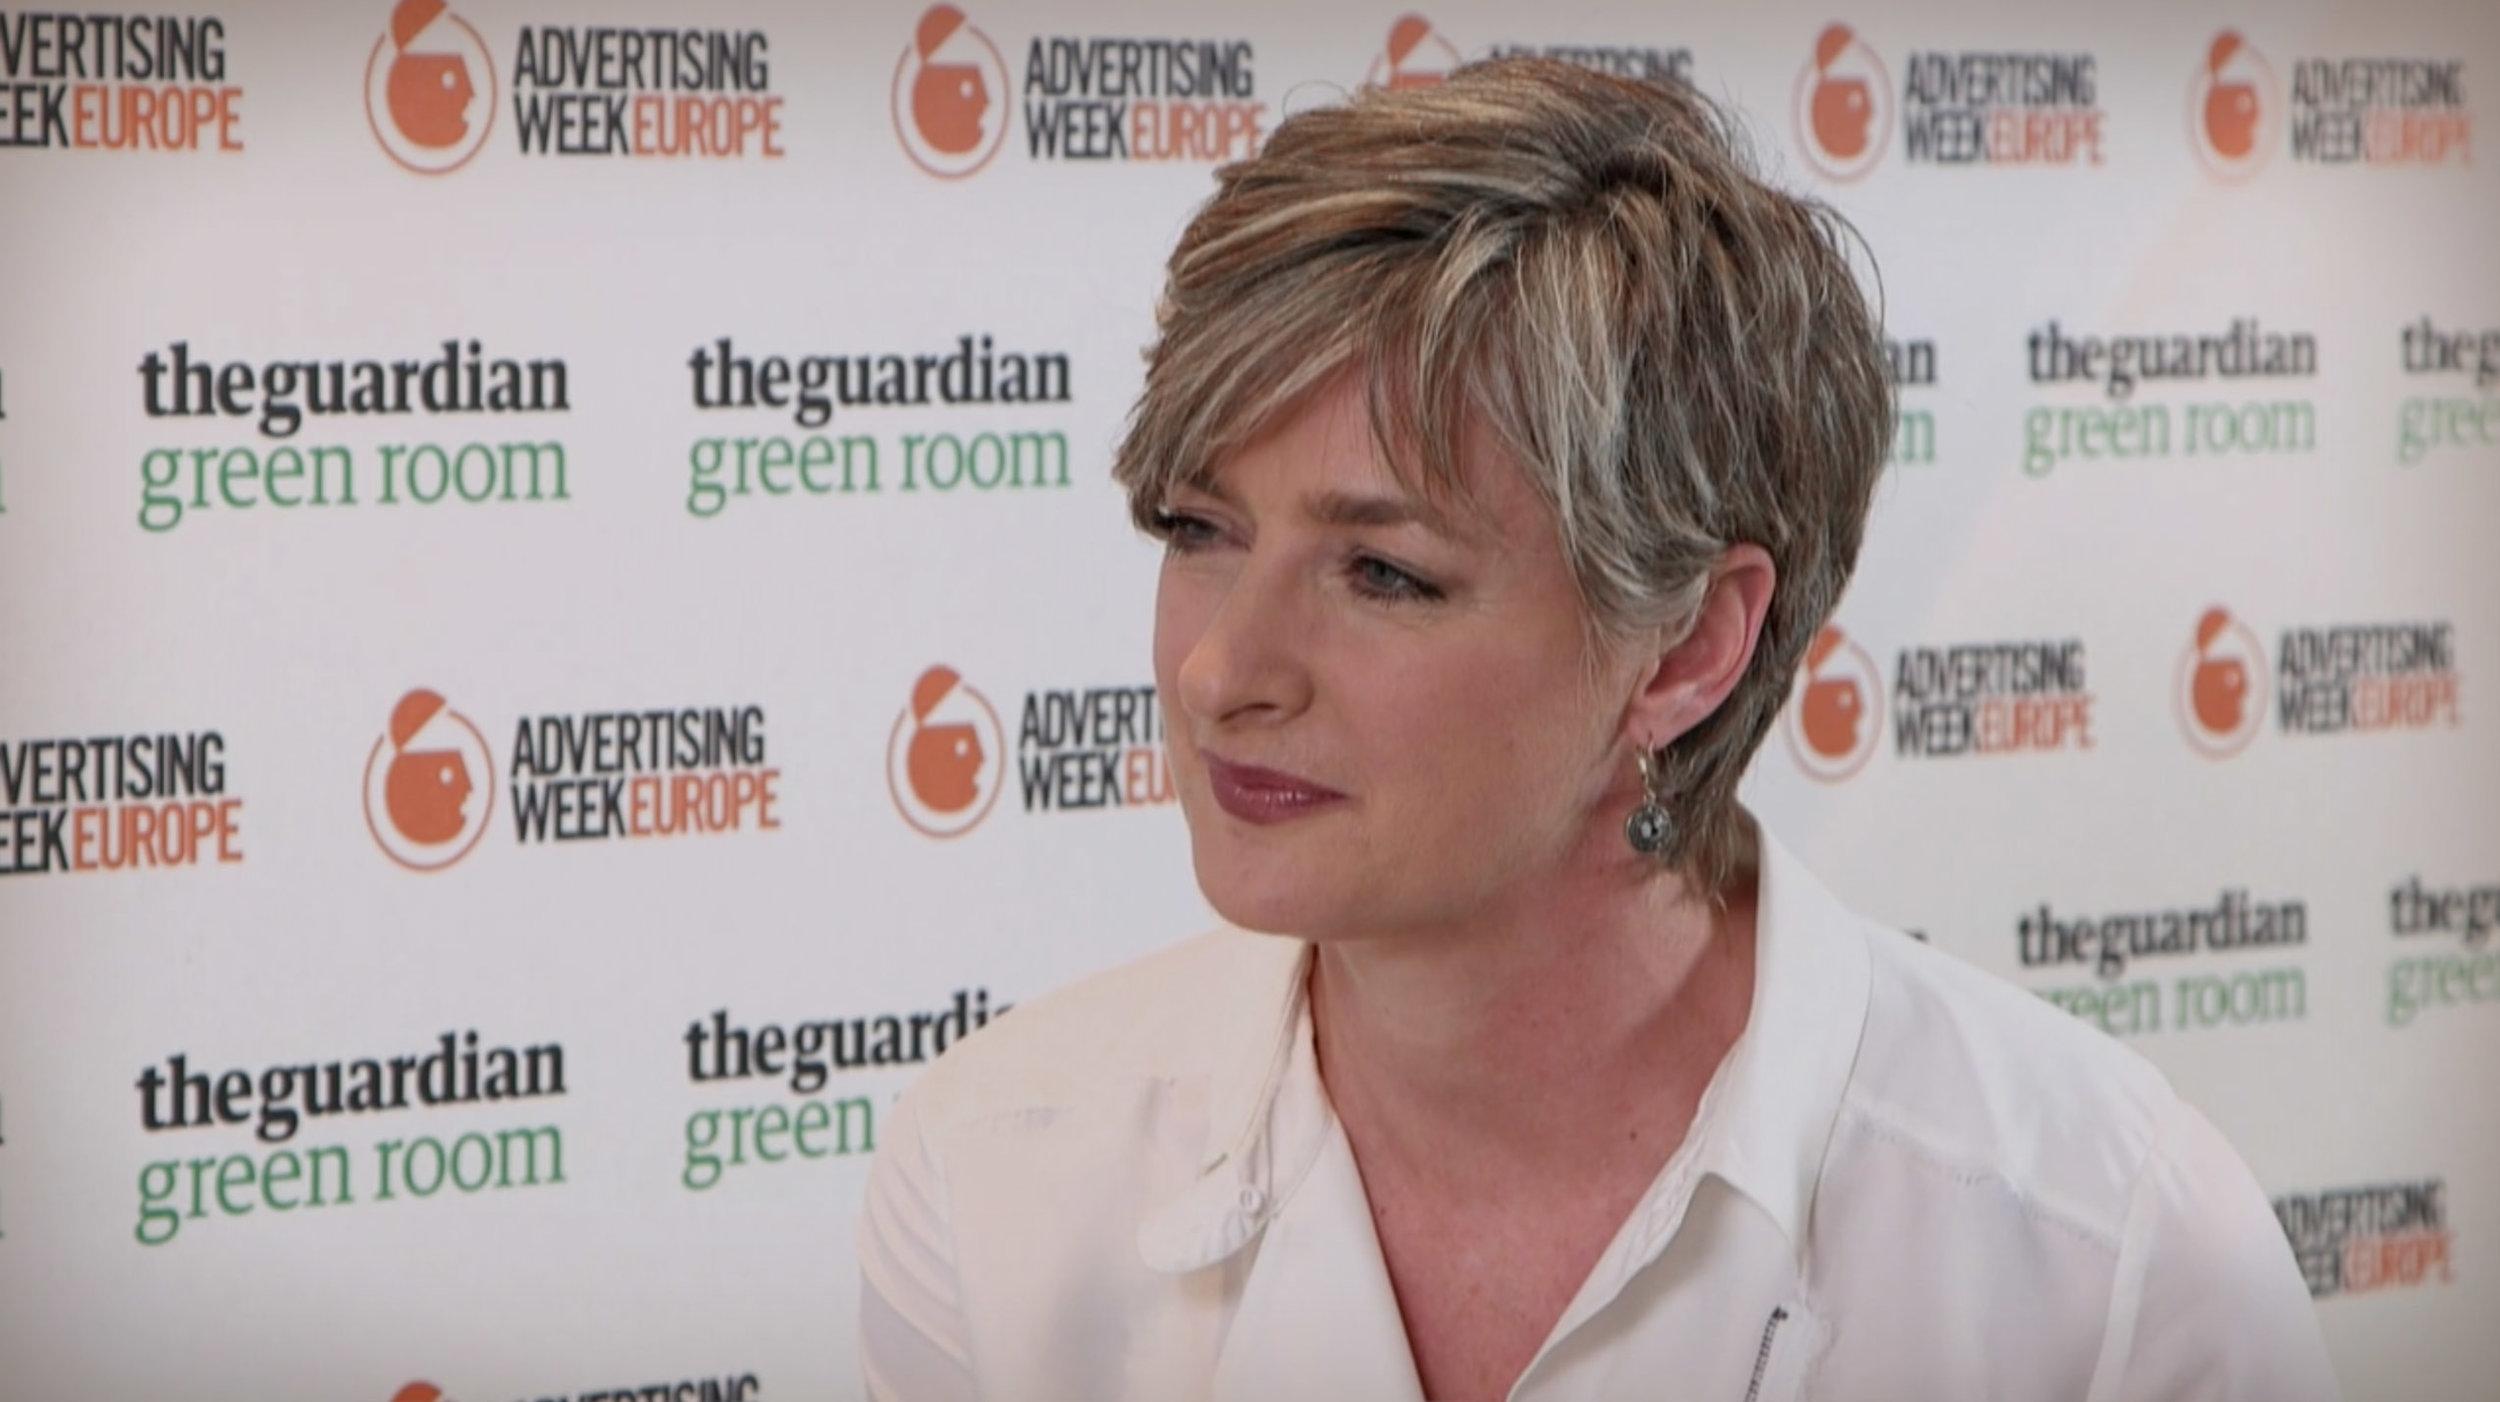 Cheryl Giovannoni, CEO Ogilvy & Mather London